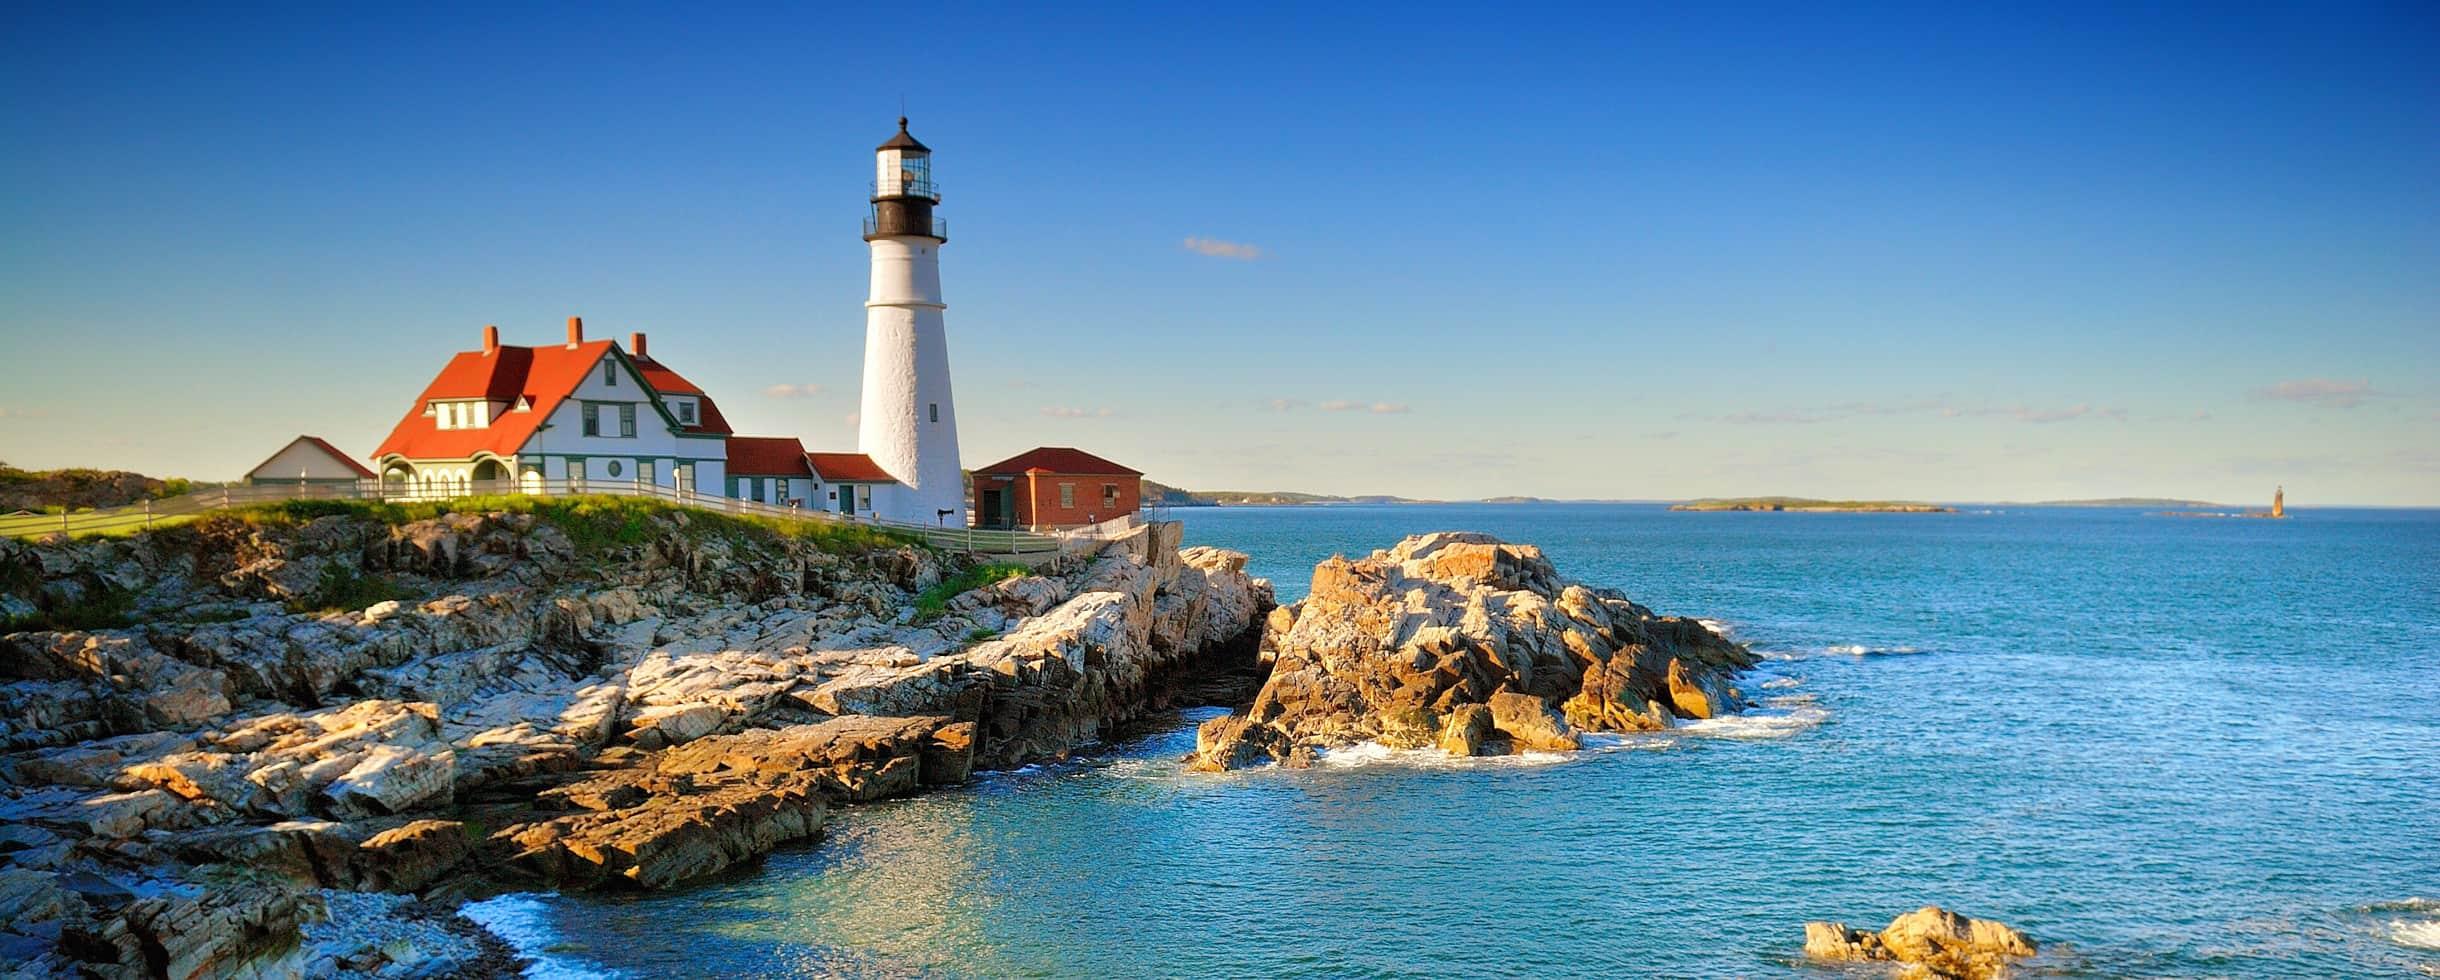 Lighthouse on the coast of Maine on a sunny day